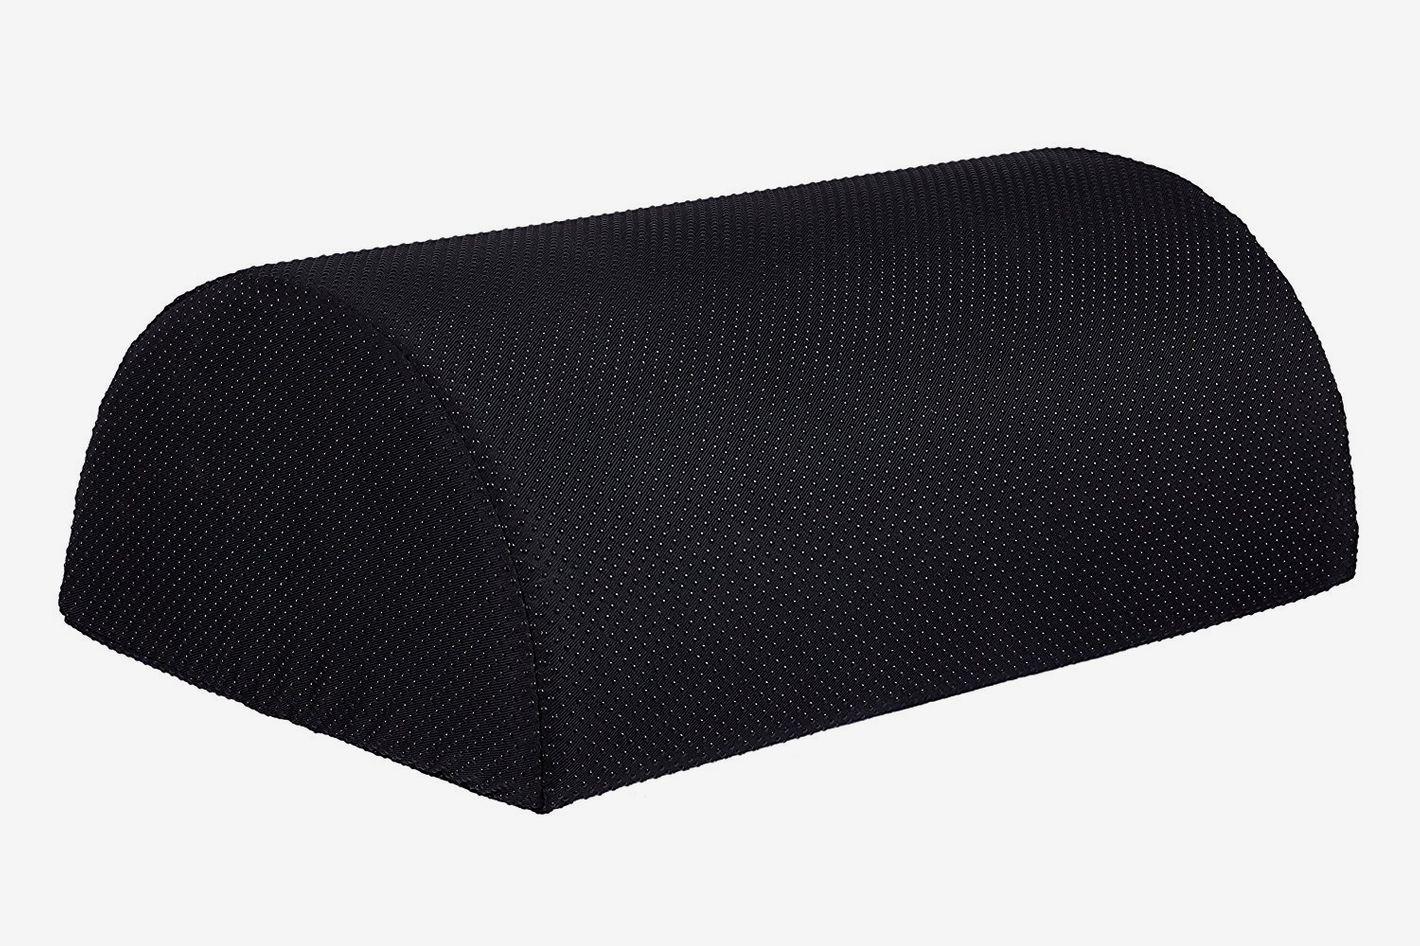 Smart n Comfy Foot Rest Cushion